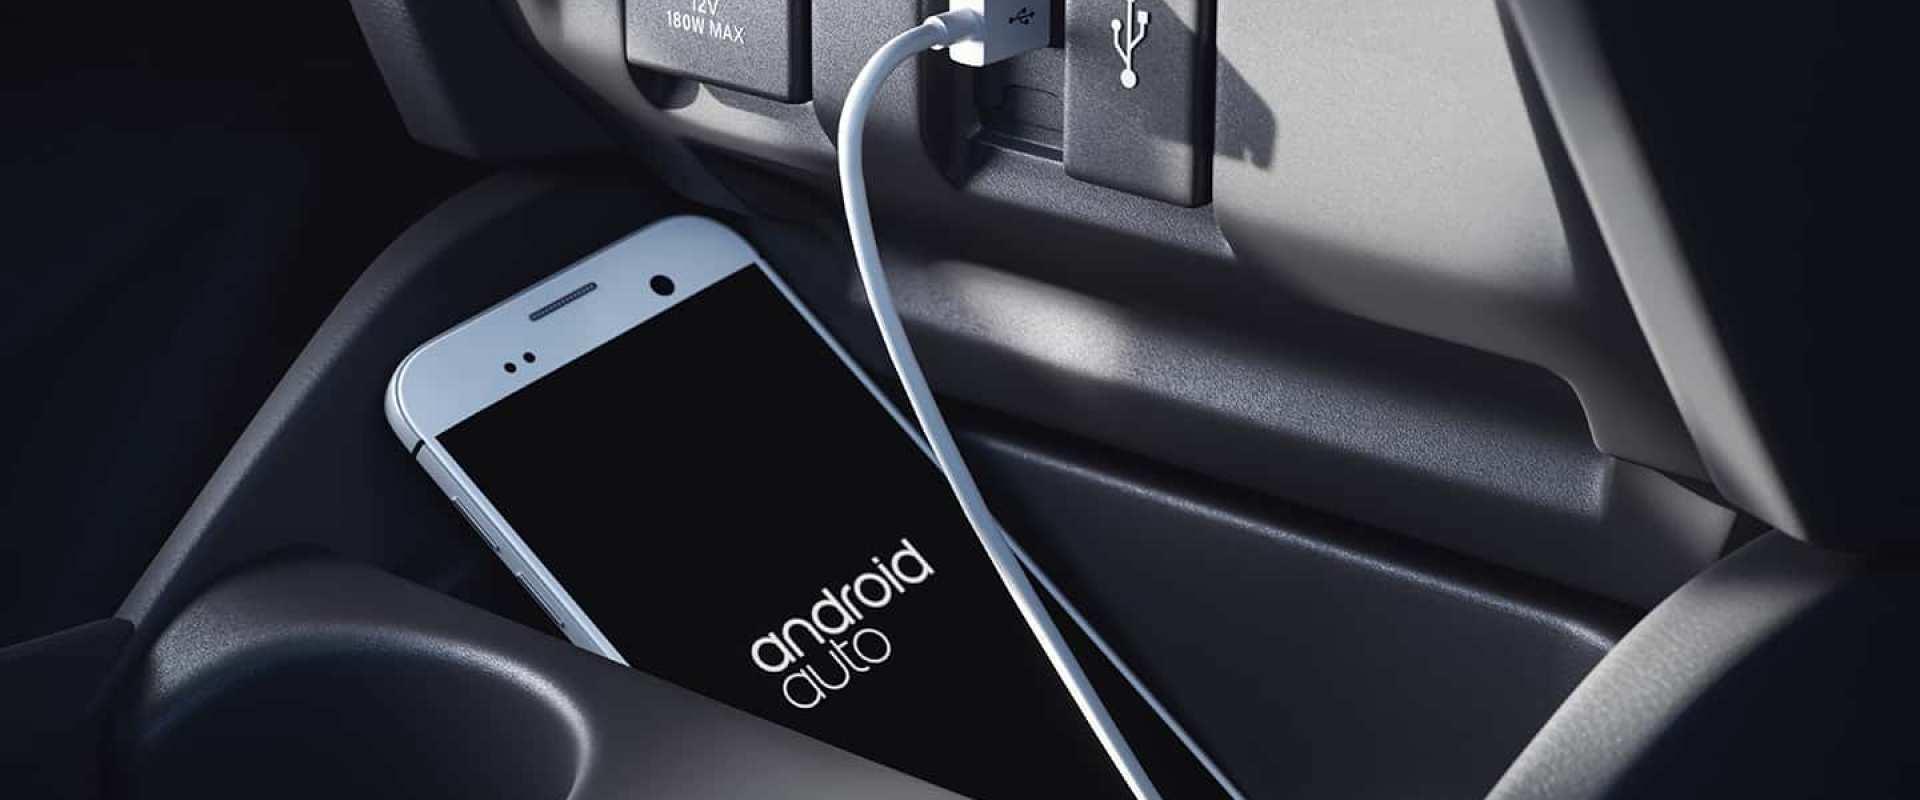 Interface intuitiva Google Android Auto®